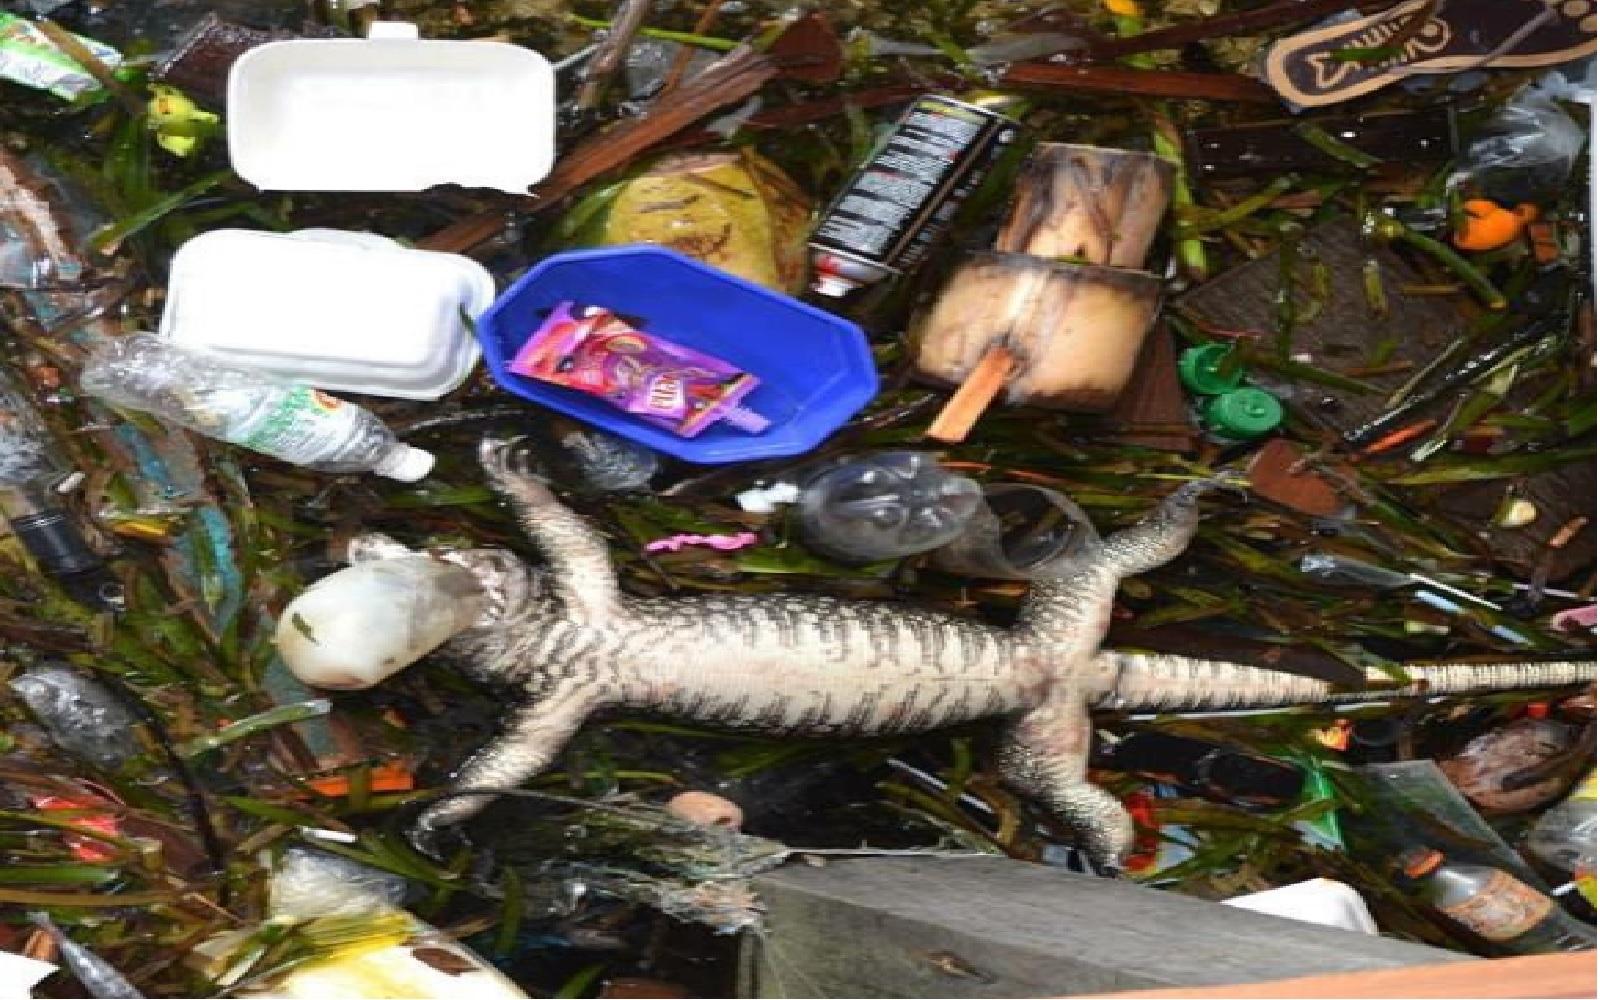 scuba-trashed-beach-2.jpg